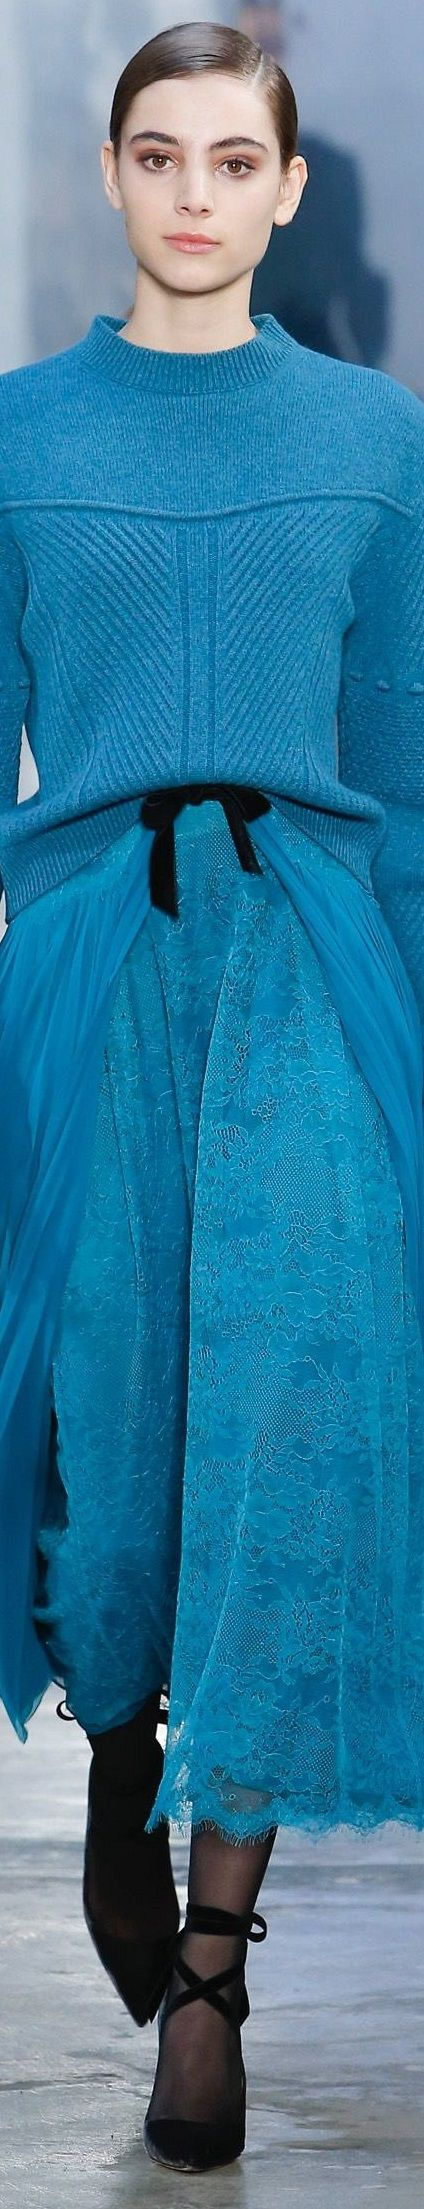 Carolina Herrera FW 2017 RTW- gorgeous color, gorgeous textures and knitwear patterns